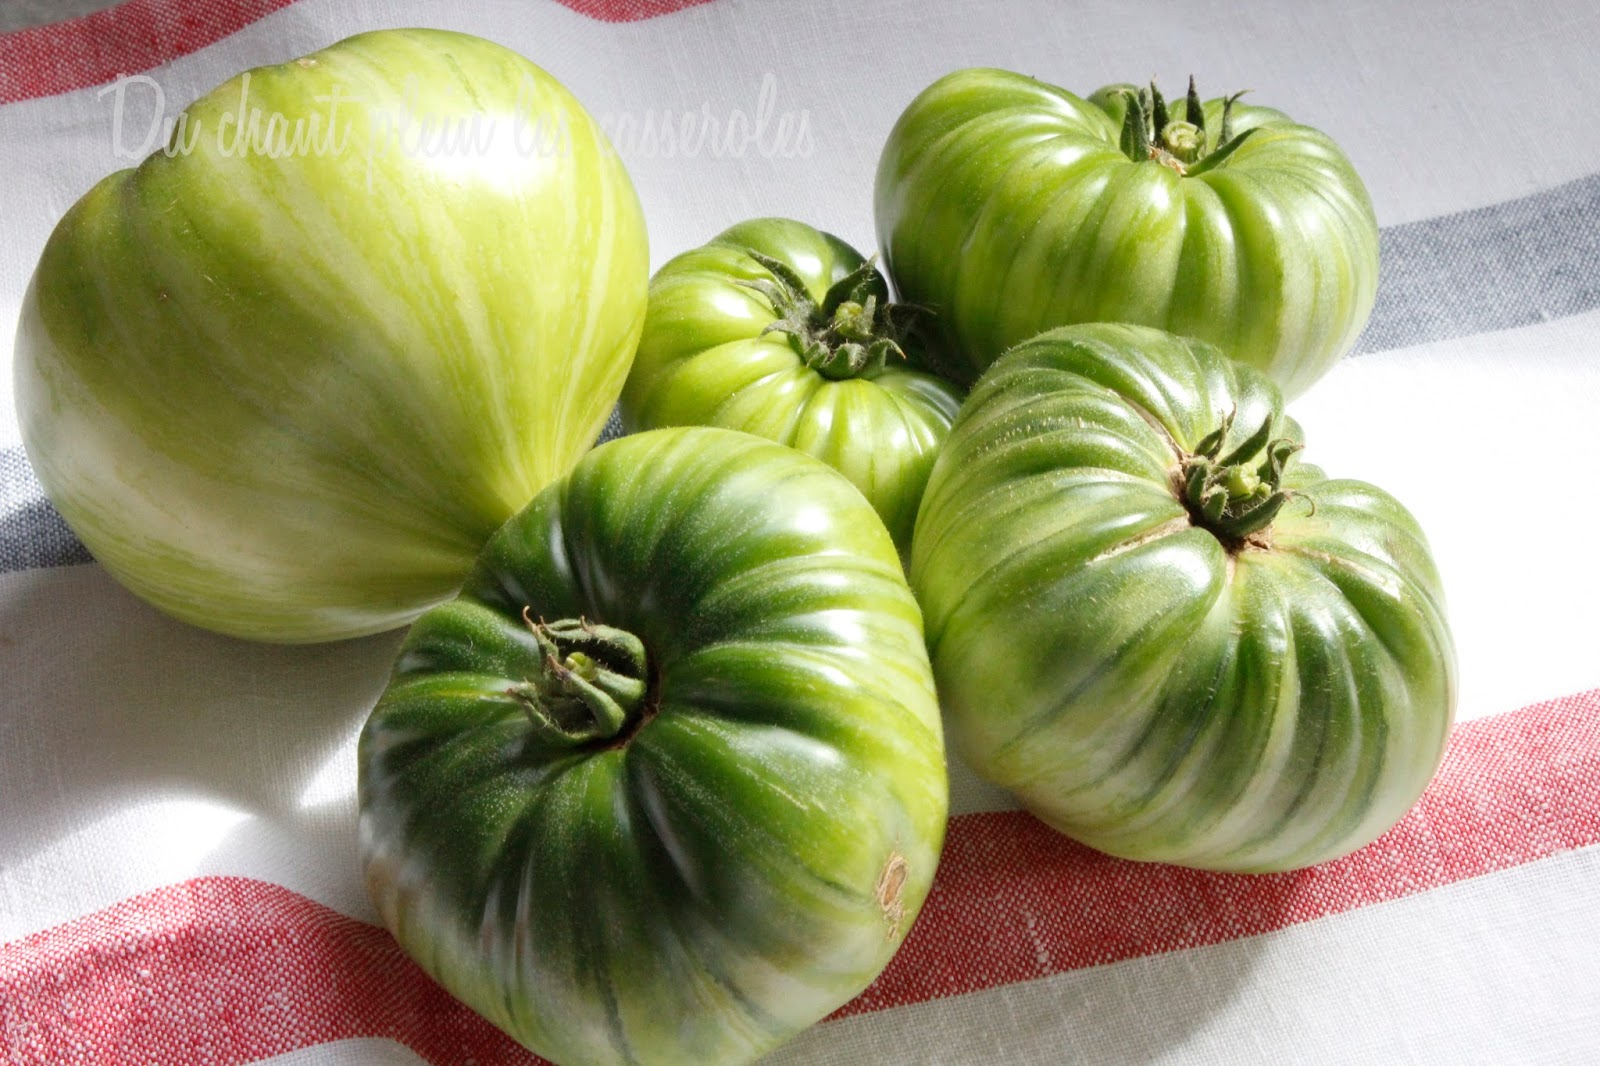 Concert de casseroles quand les tomates restent vertes variantes aigres douces - Quand repiquer les tomates ...